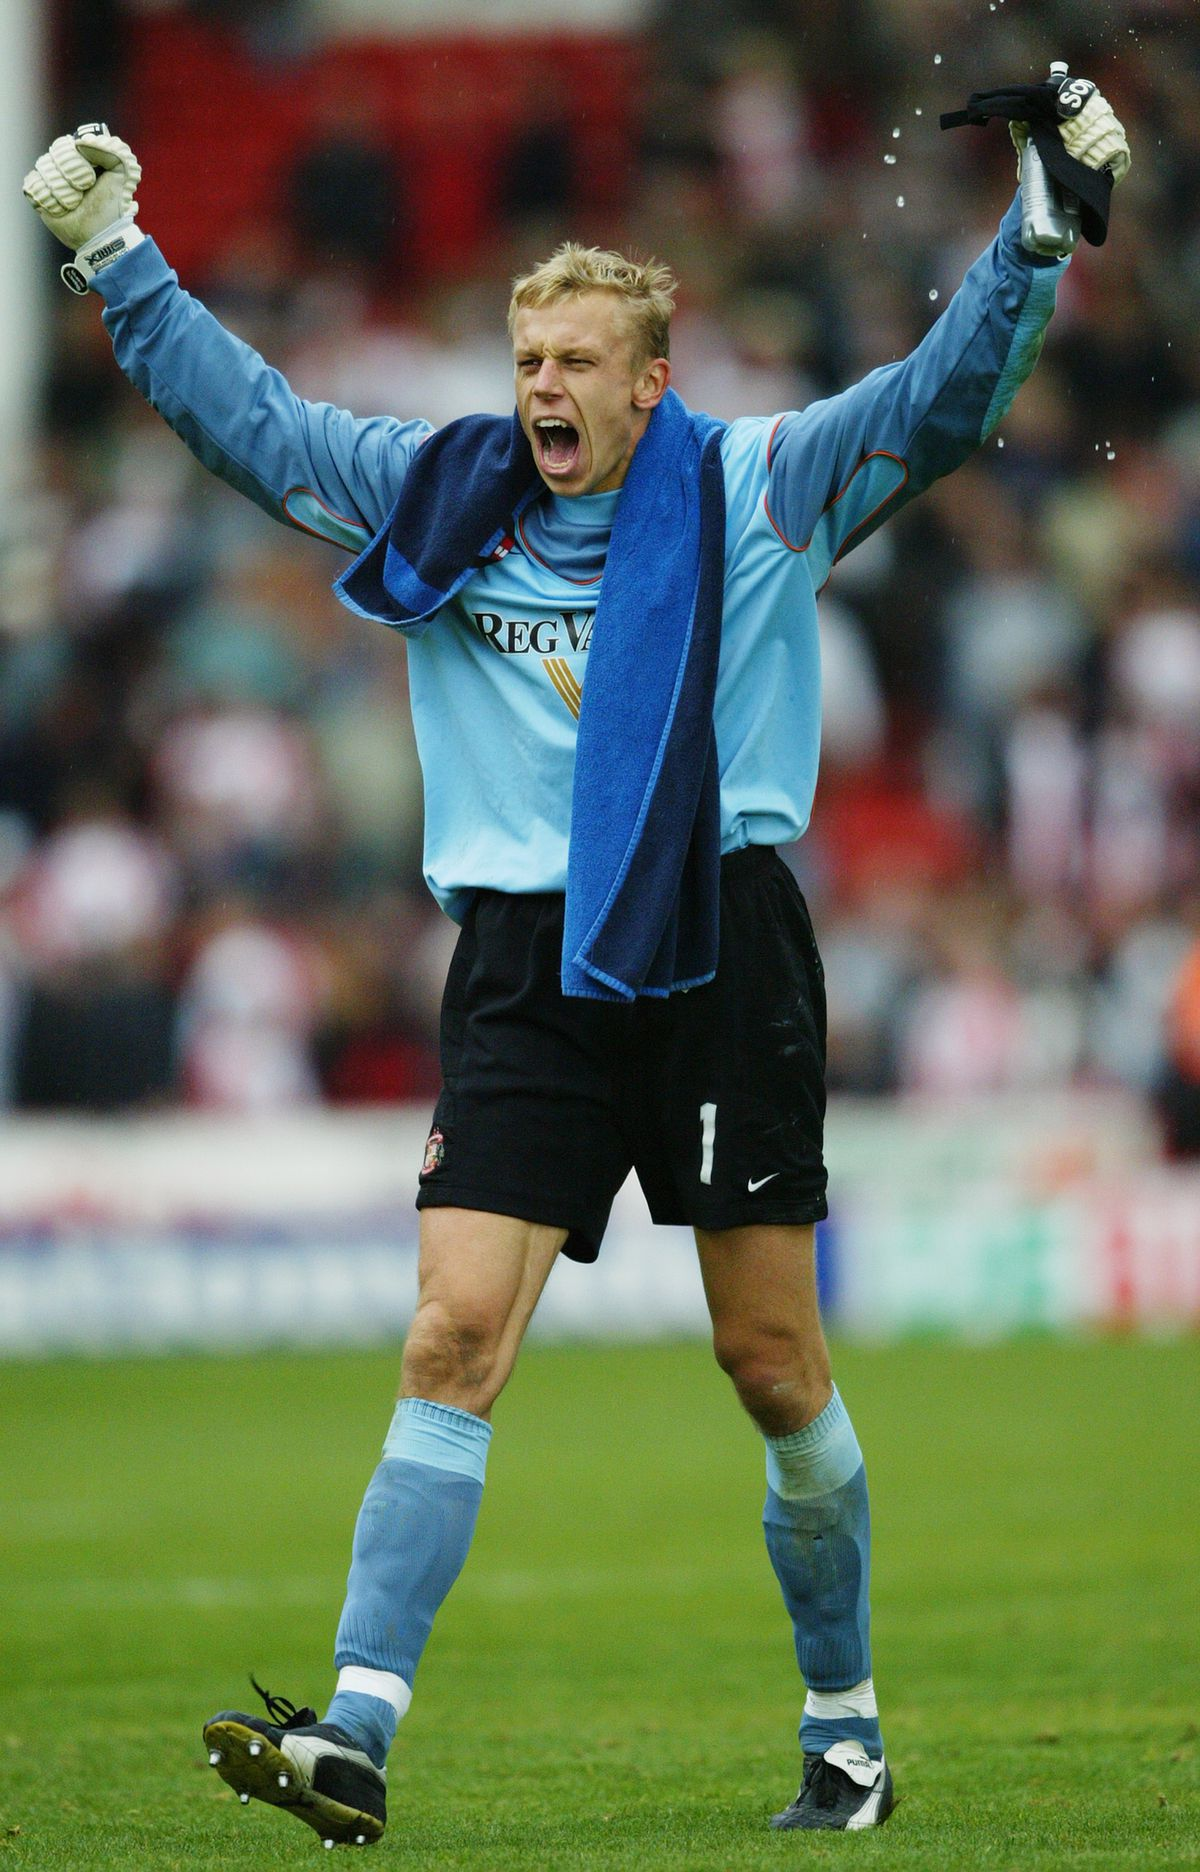 Mart Poom of Sunderland celebrates